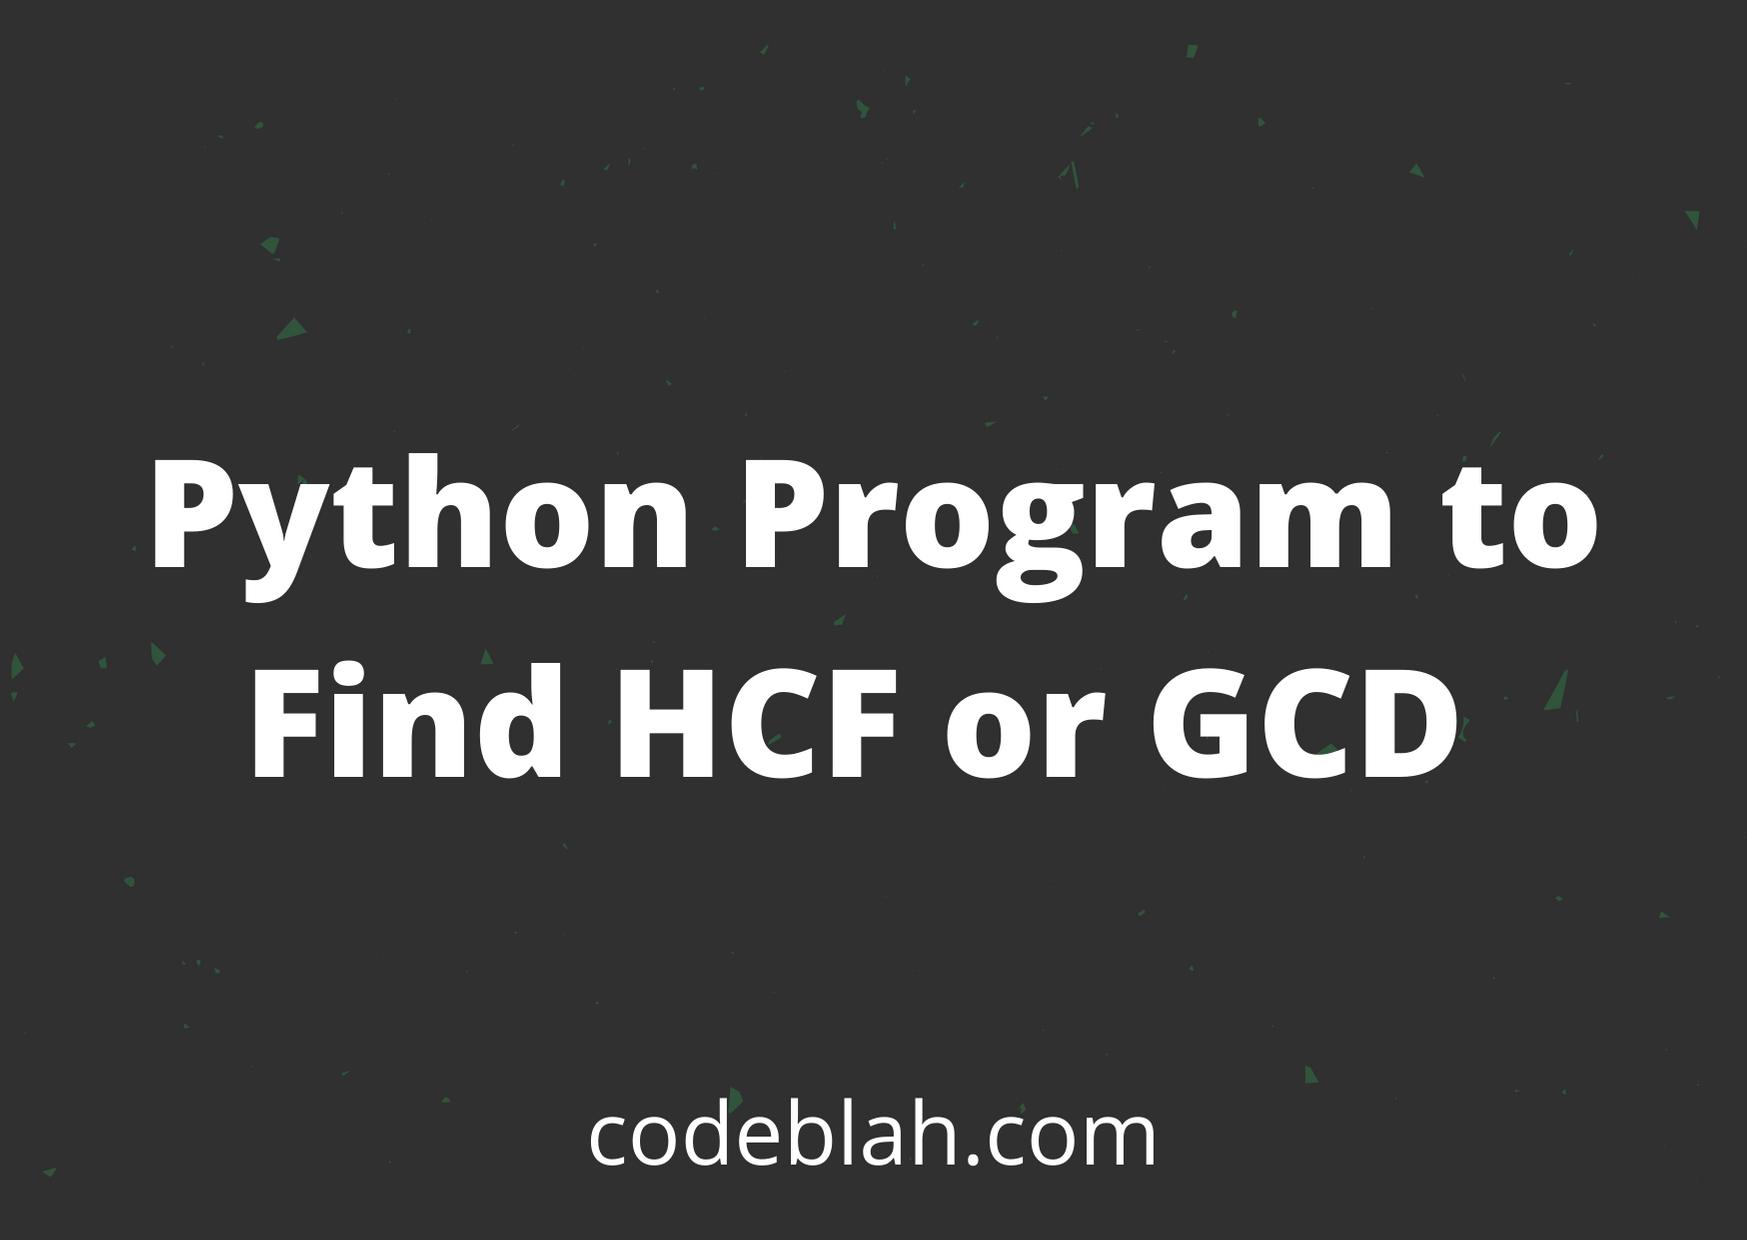 Python Program to Find HCF or GCD